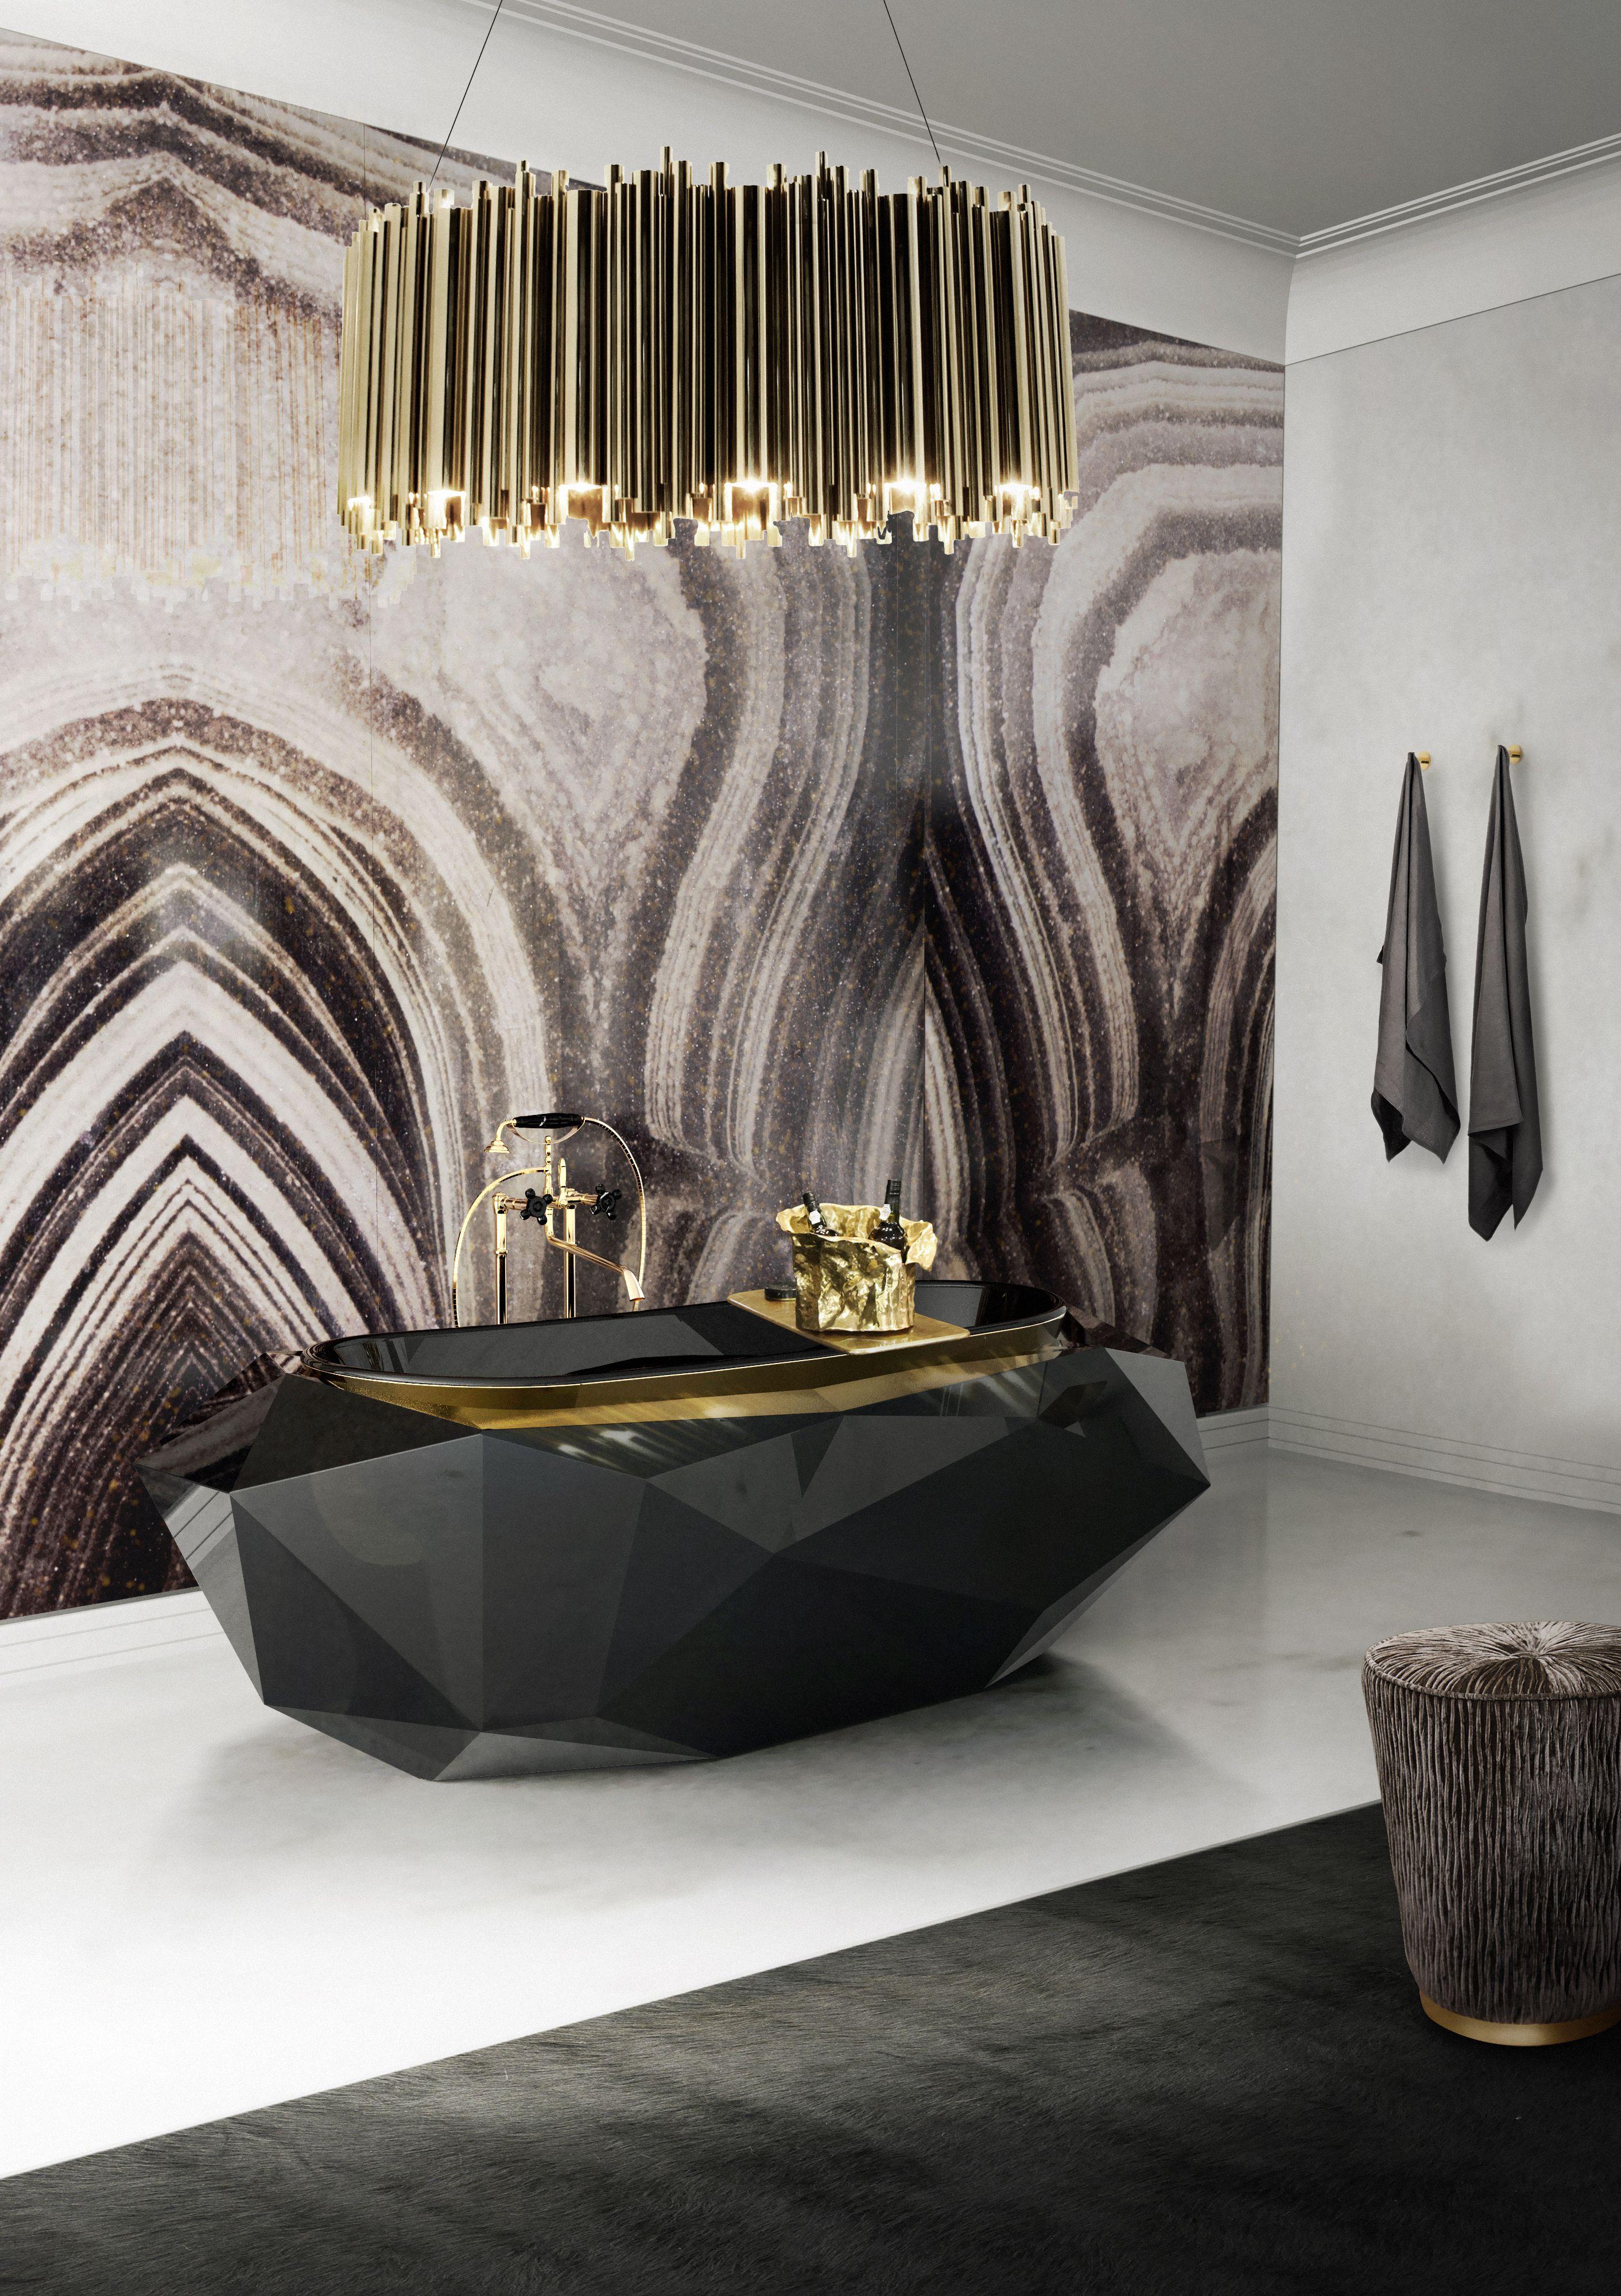 Diamond Bathtub | Pinterest | Elegant bathroom decor, Bathtubs and ...